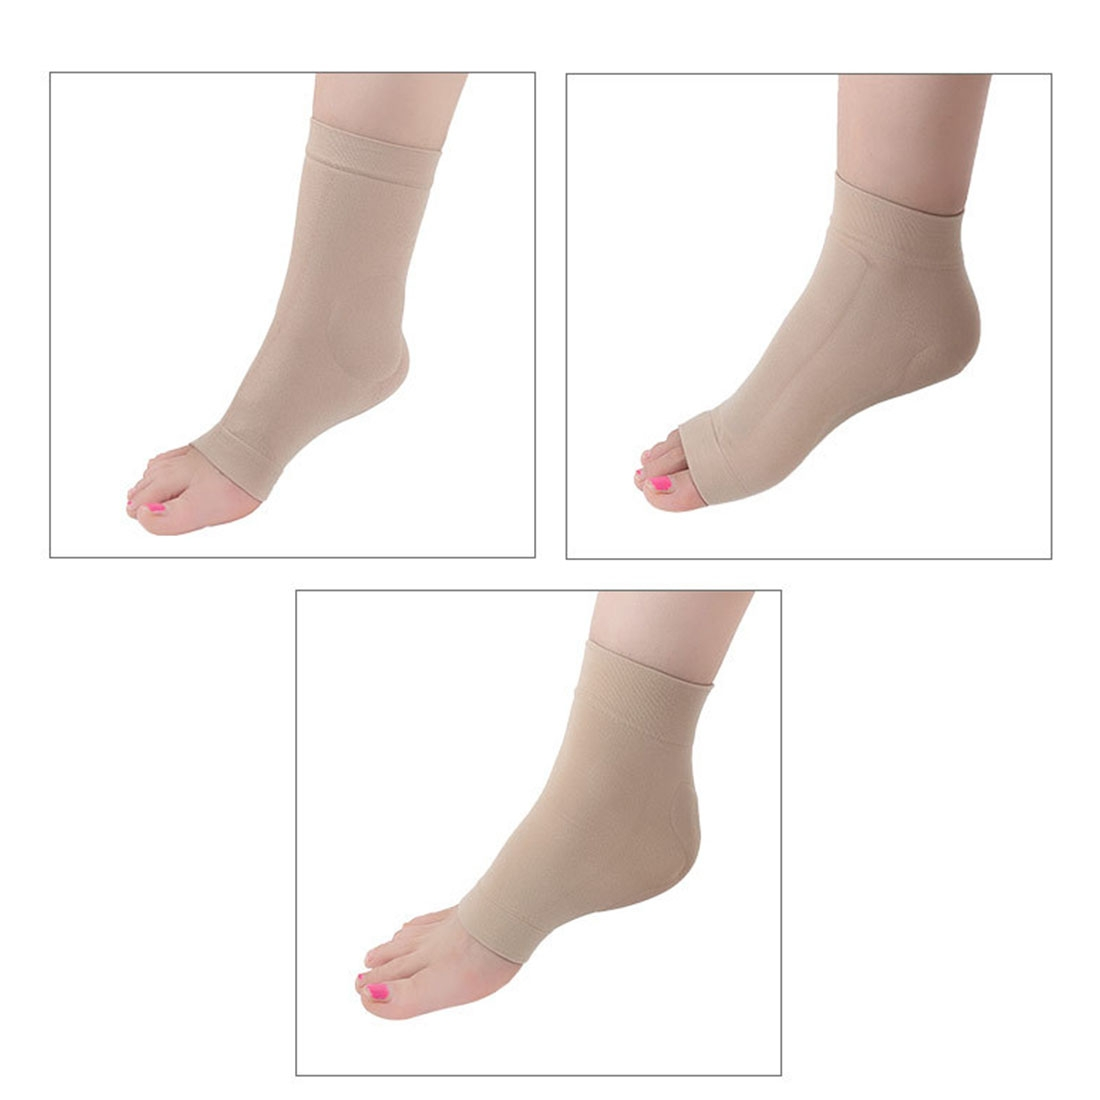 SEBS Anti-Cracking Ankle Protection Socks Bandage Protective Sleeve, Double SEBS Long Style